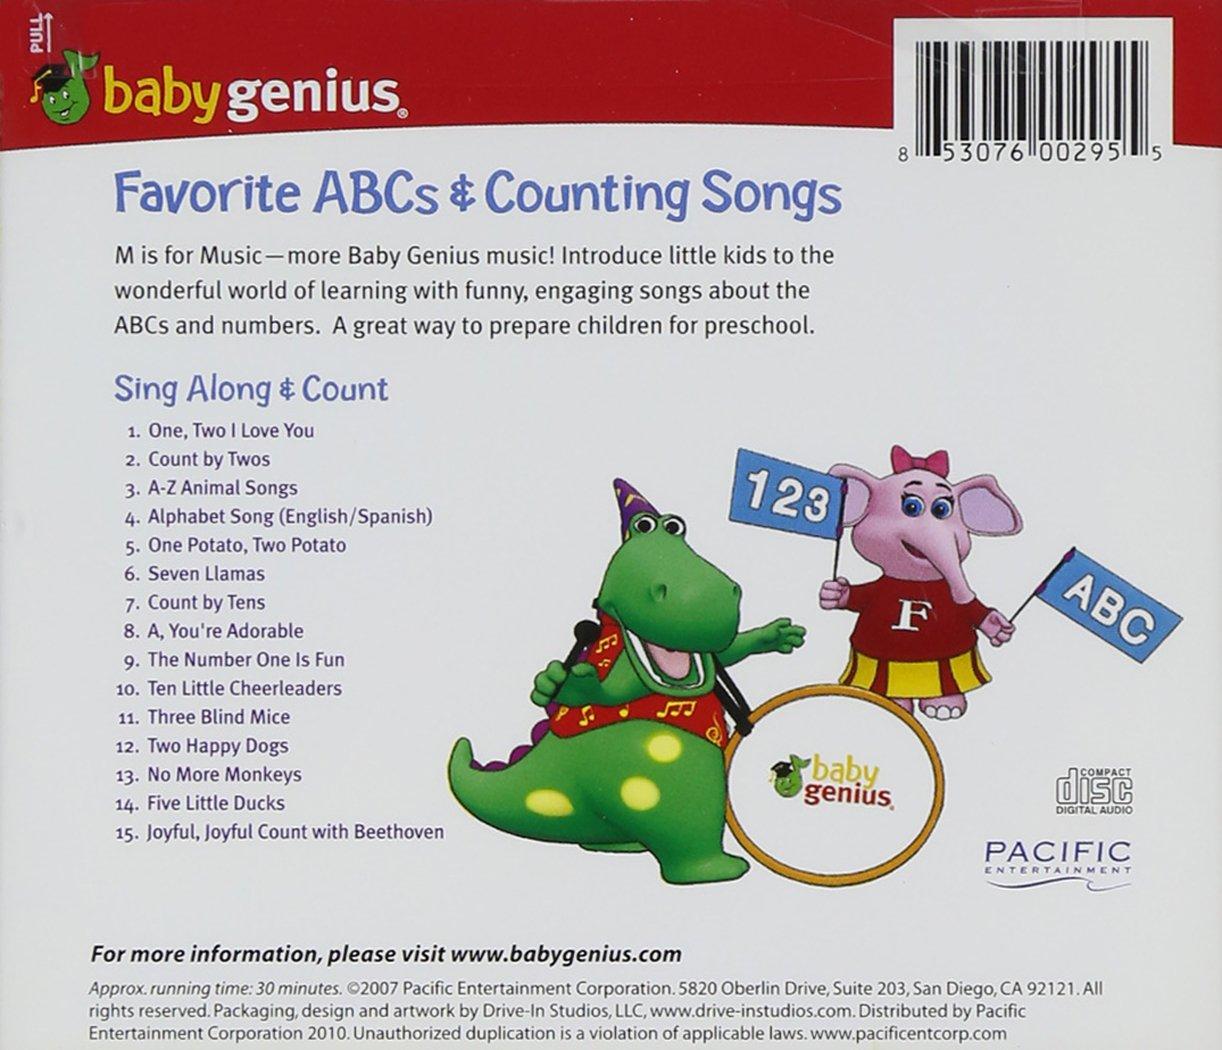 Baby Genius Favorite Counting Songs Amazoncom Music - 30 genius packaging designs